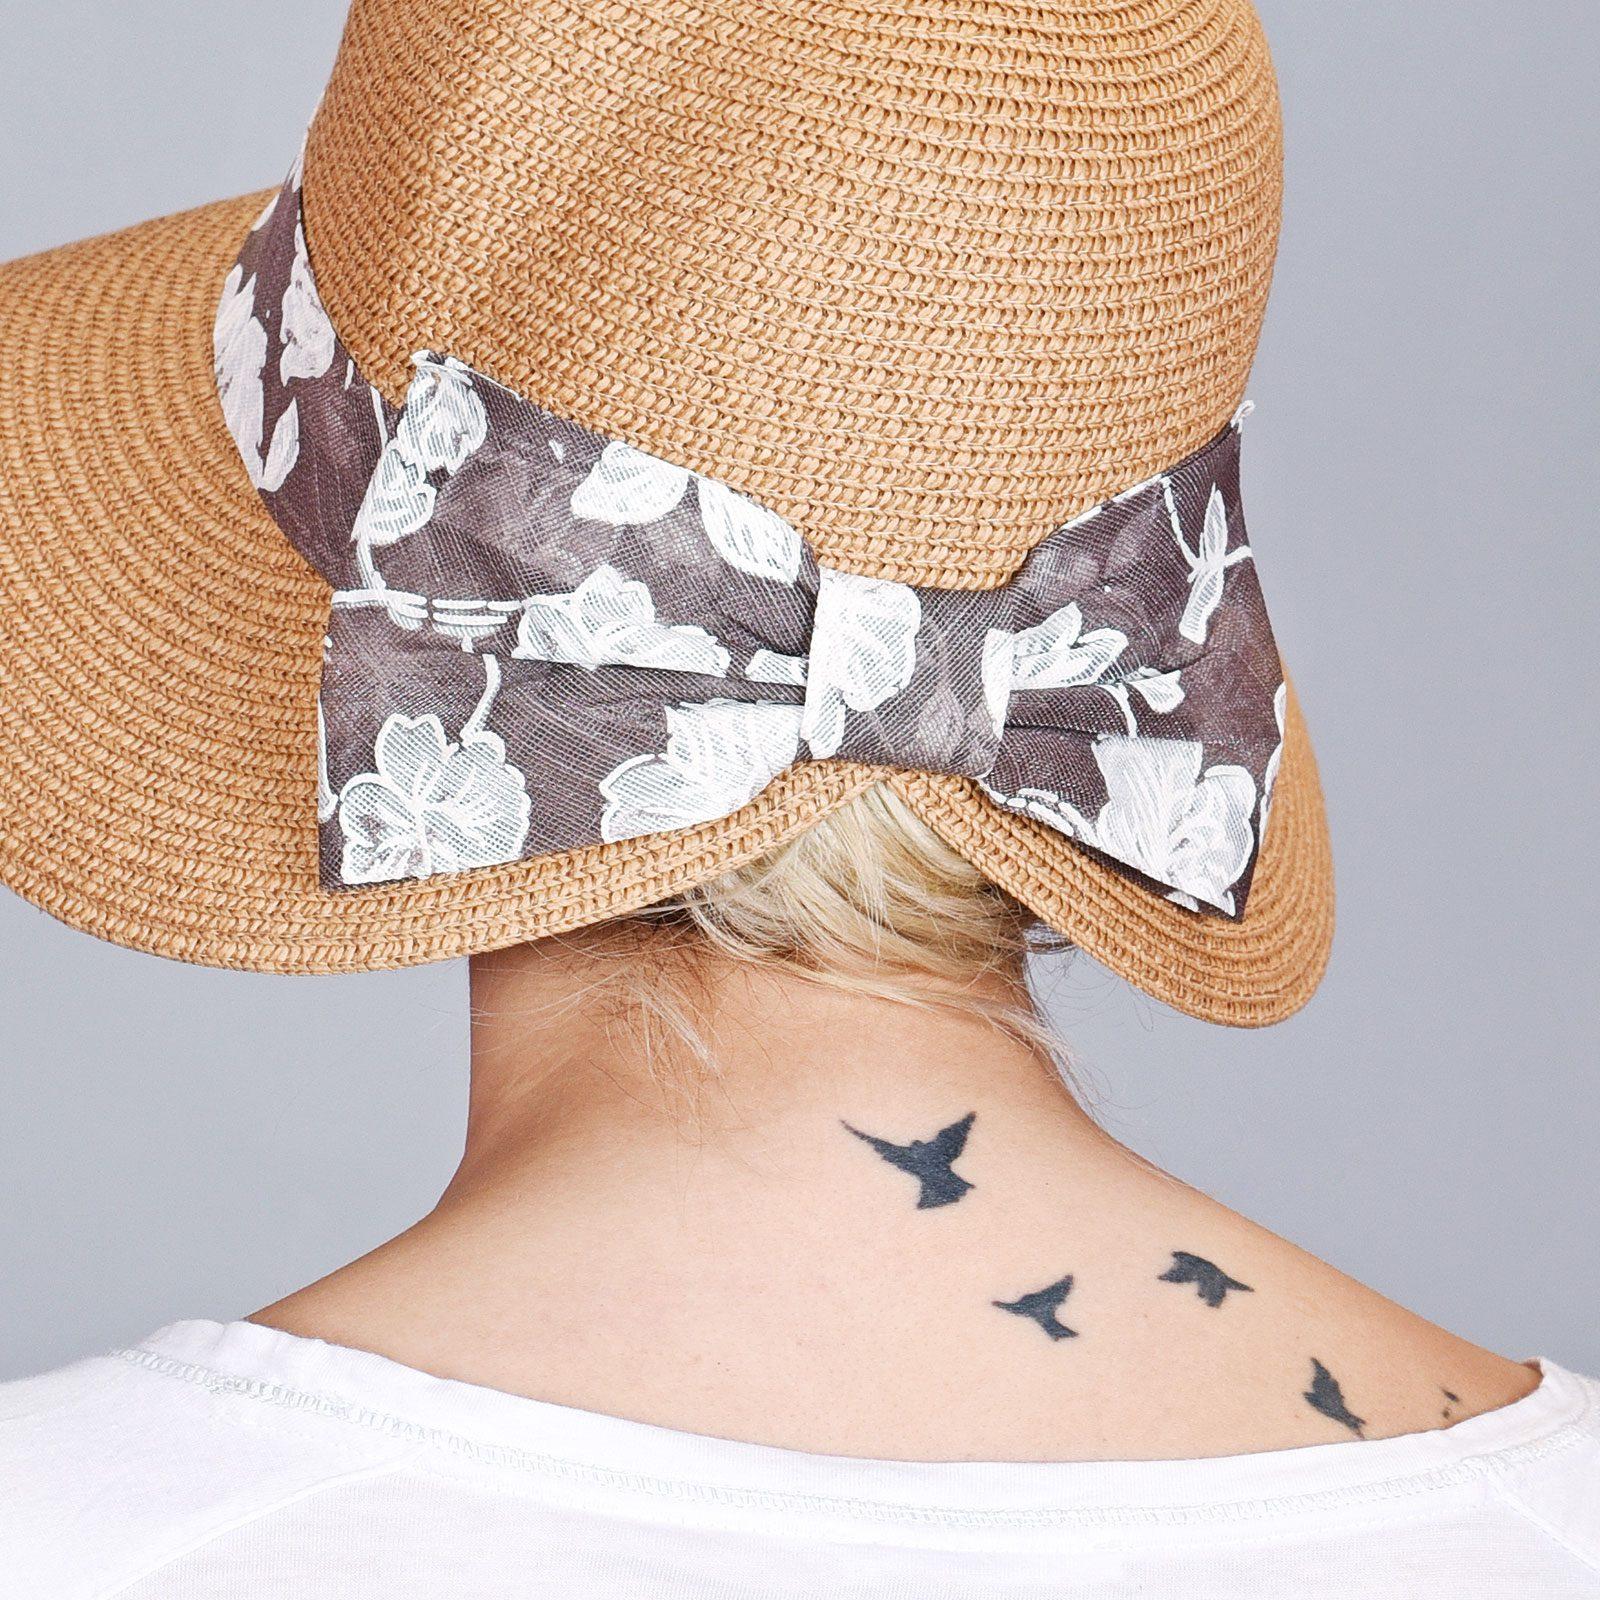 http://lookbook.allee-du-foulard.fr/wp-content/uploads/2018/06/CP-00908-VF16-3-chapeau-de-paille-femme-beige-ruban-gris-1600x1600.jpg